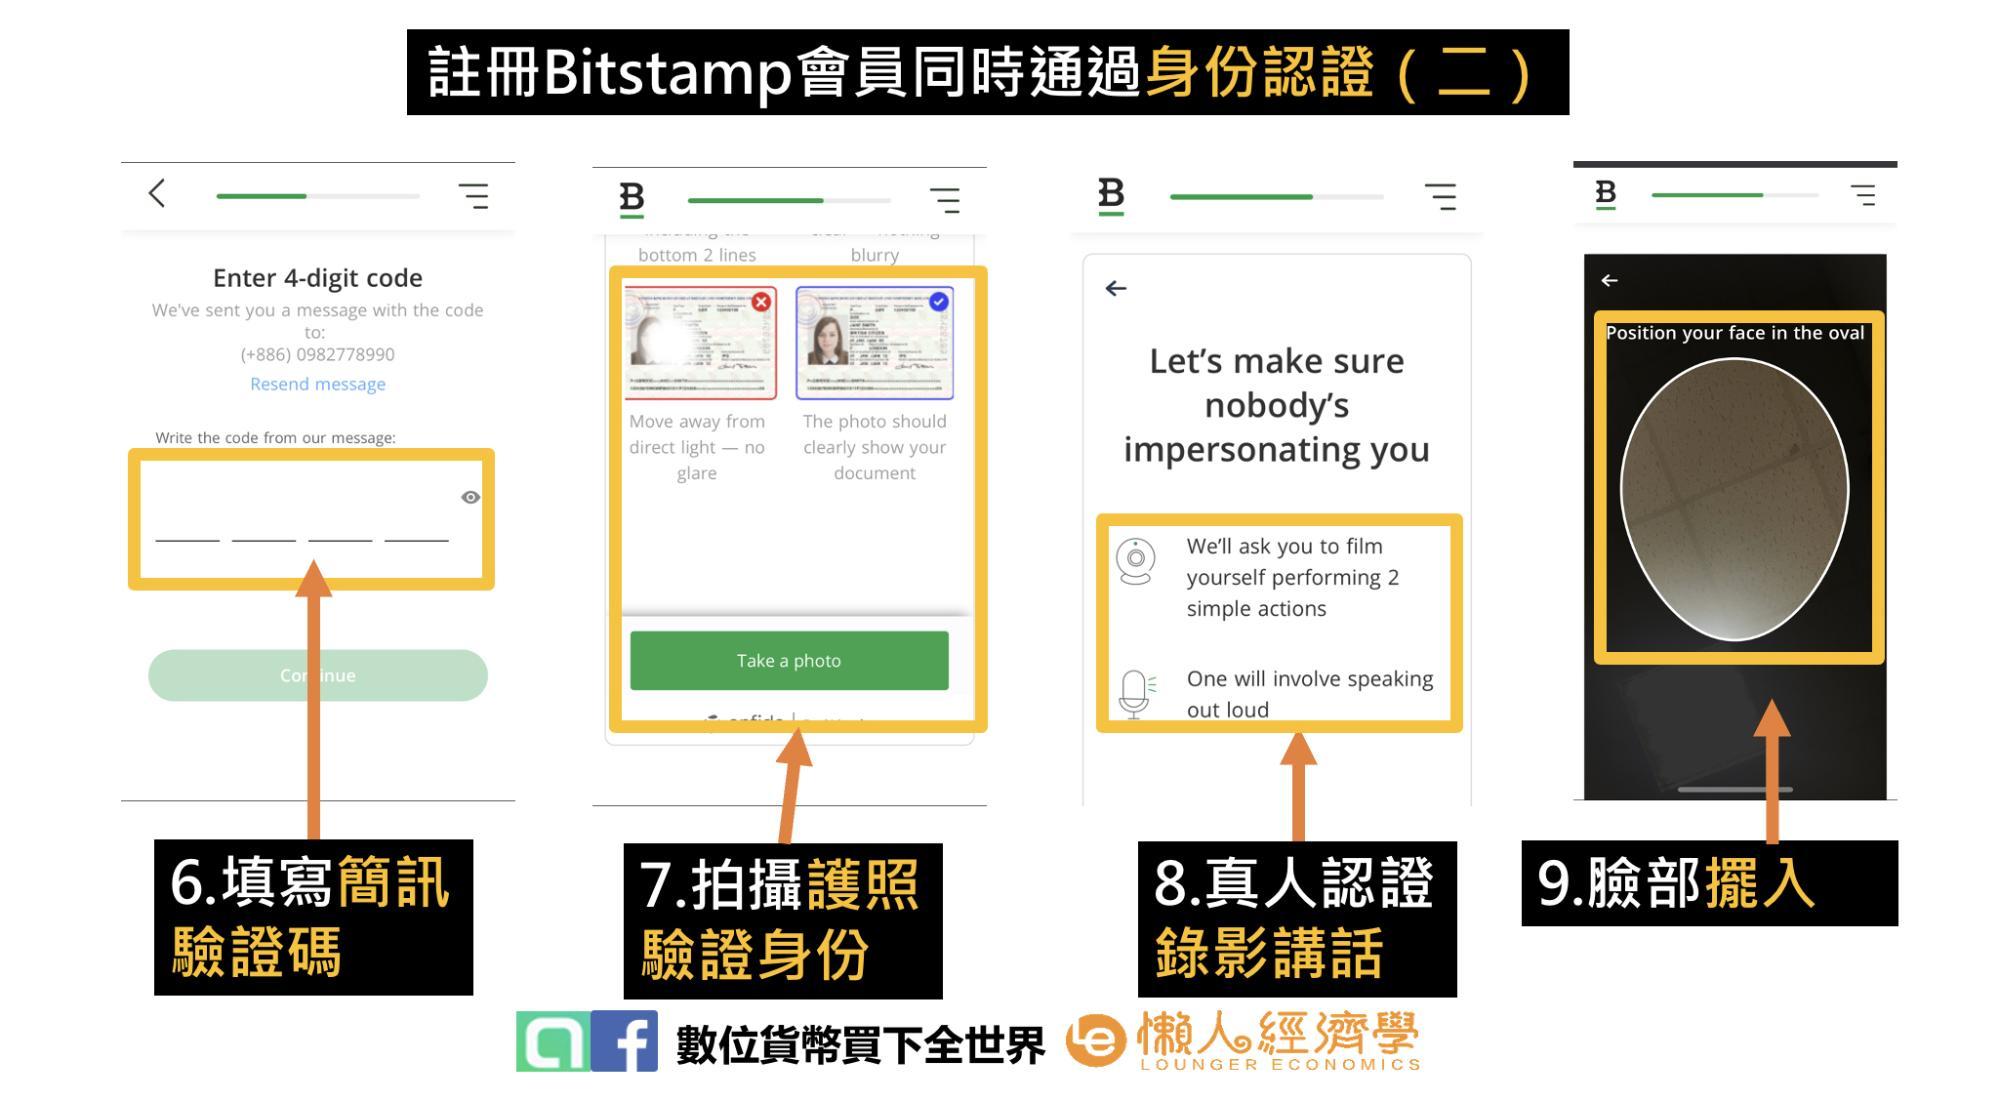 Bitstamp交易所註冊同時進行身份認證流程(二)